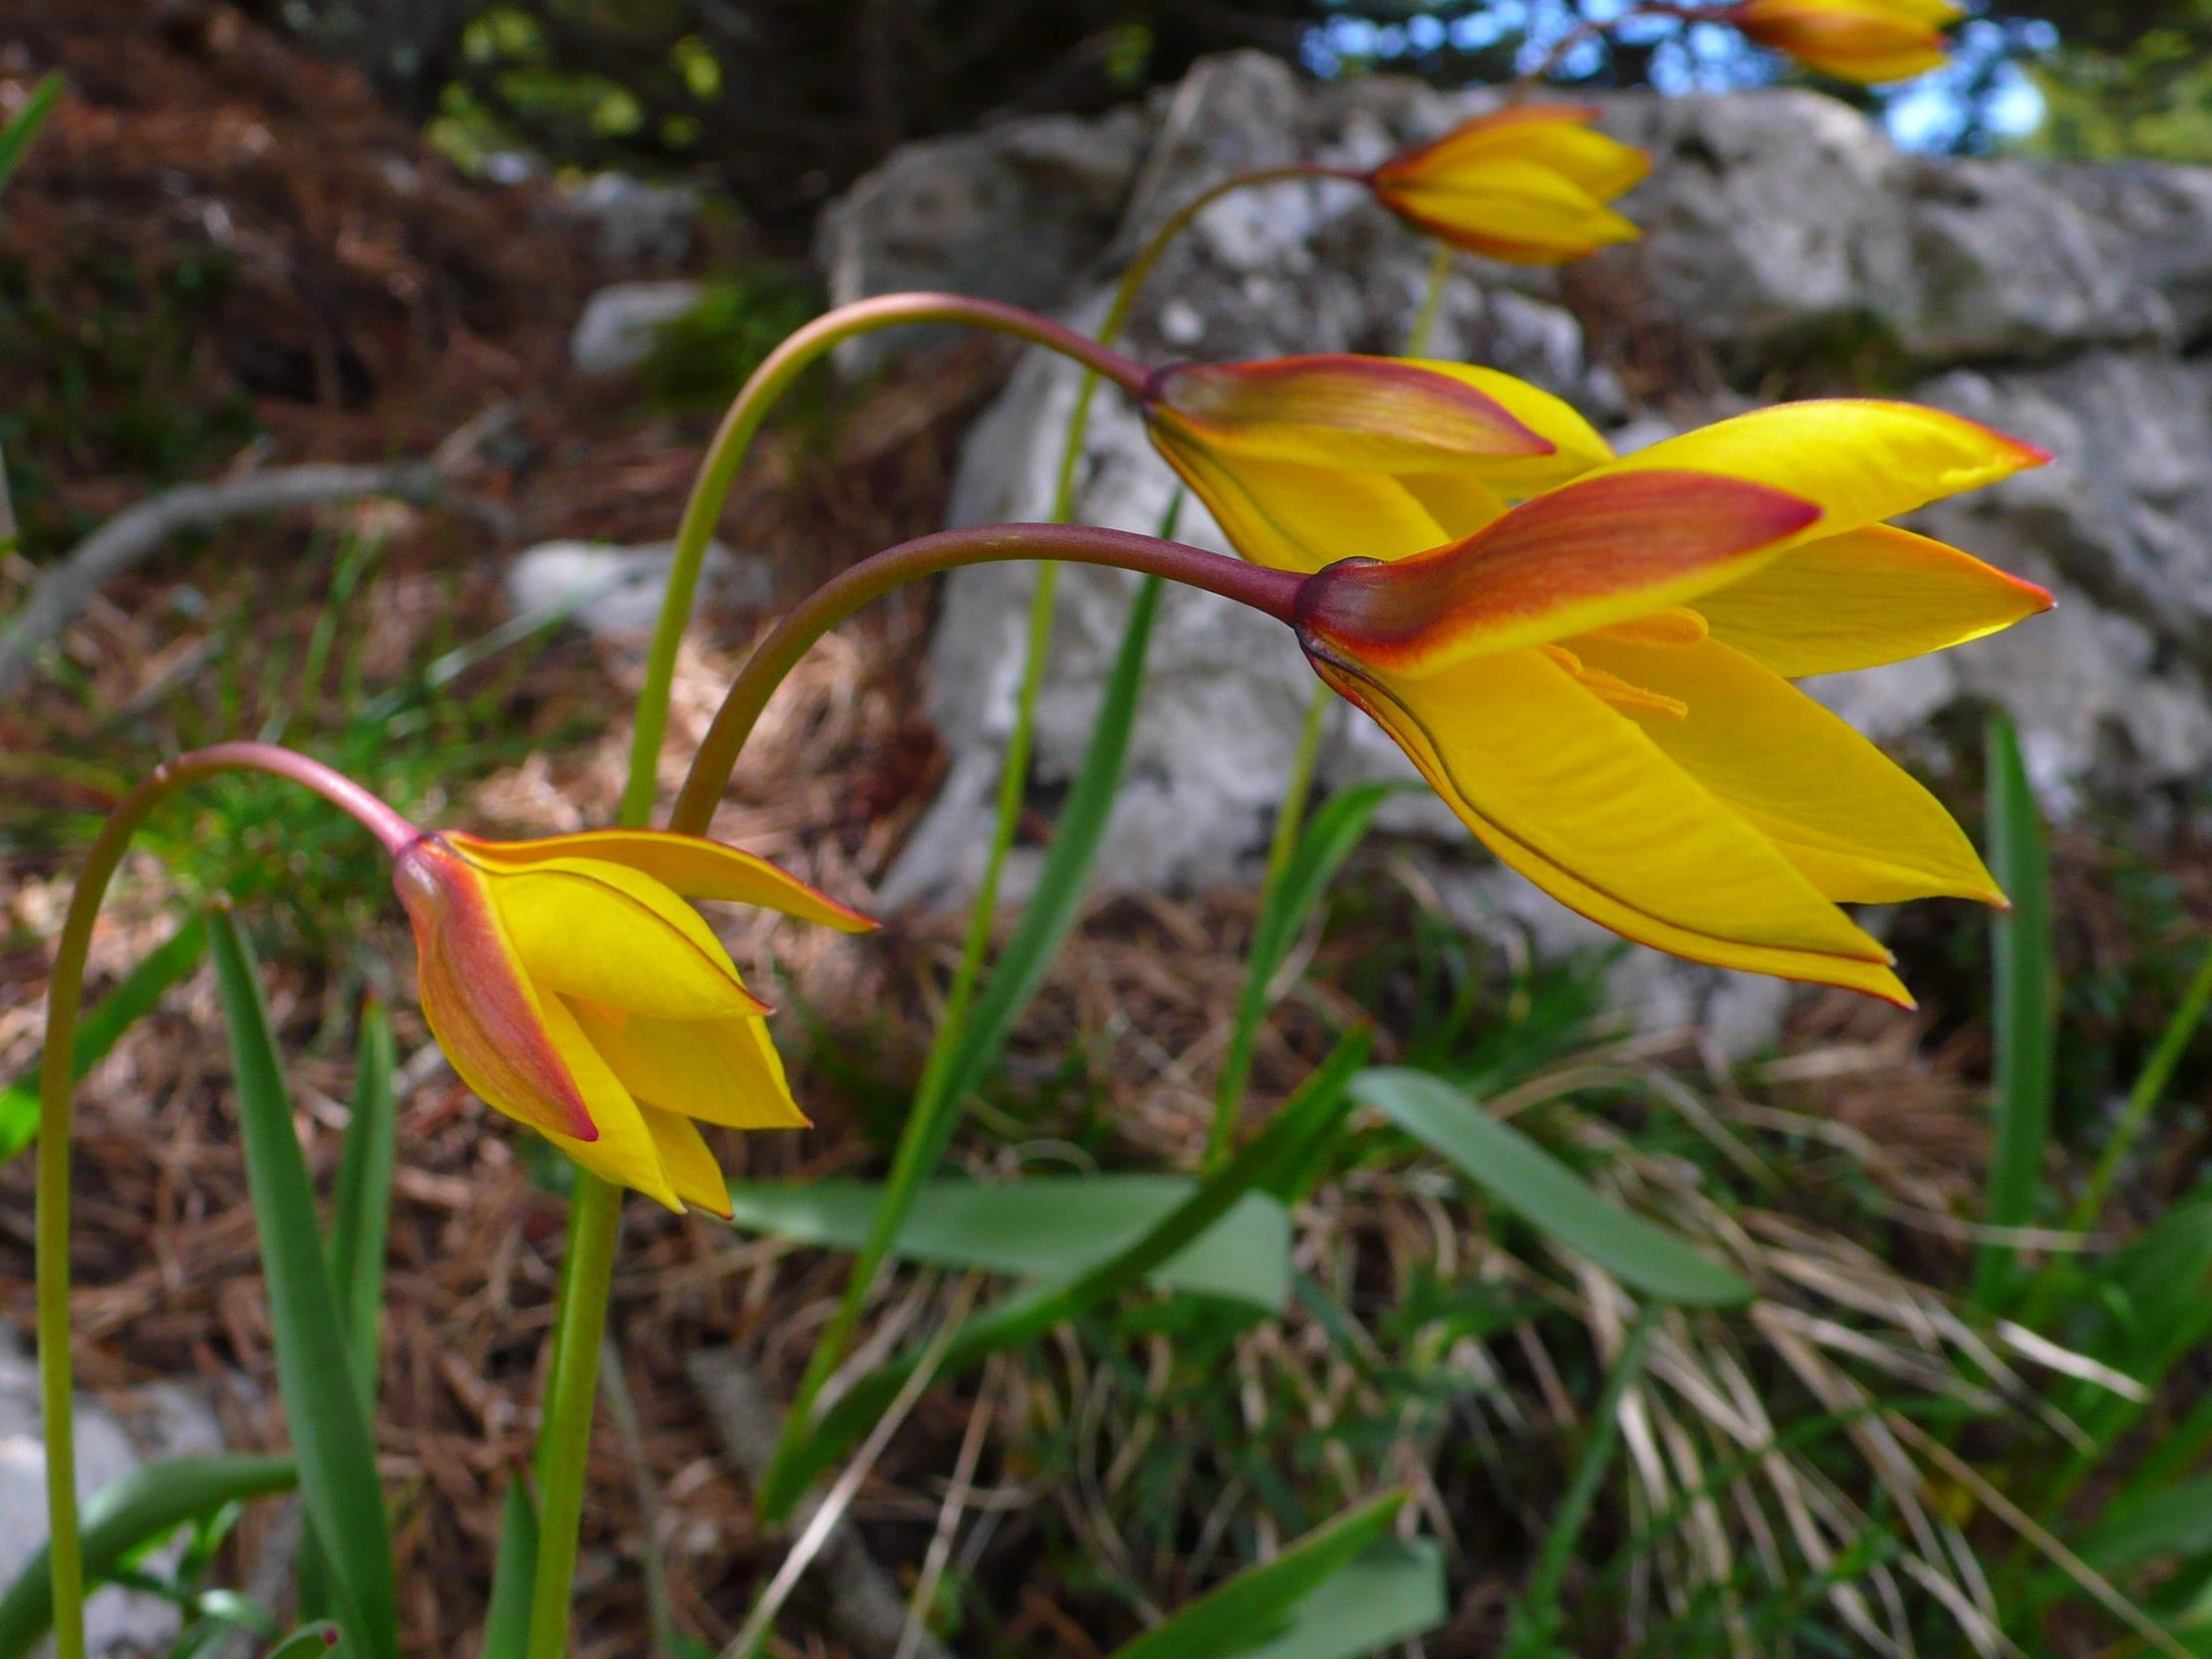 045_Wild Tulip_Rousset.JPG